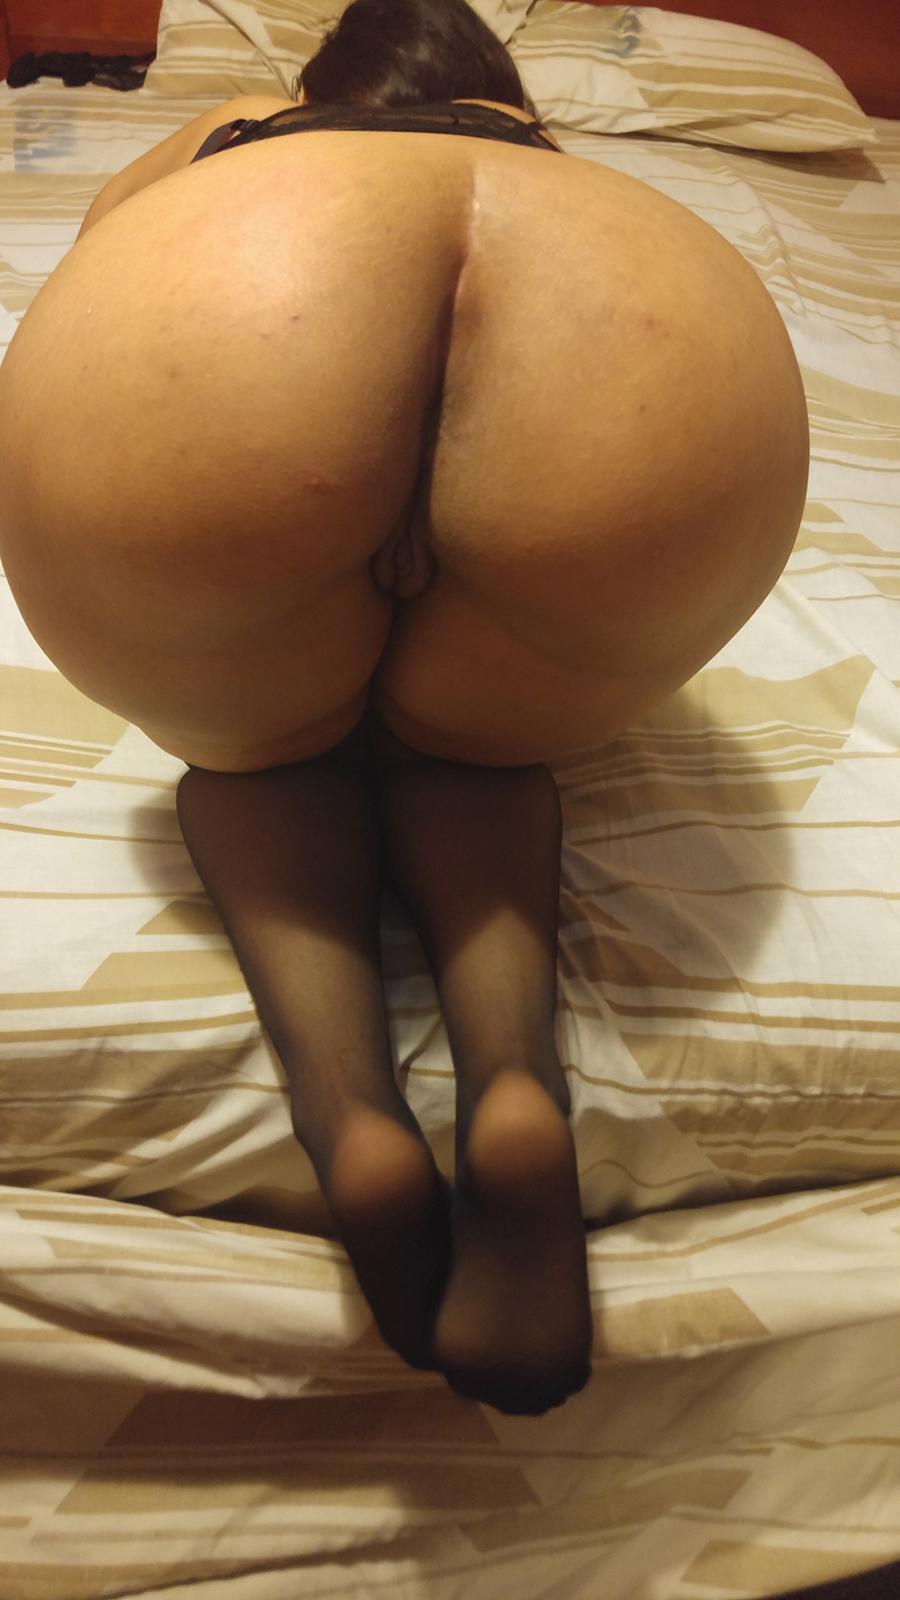 Abuela Nalgona Porno maduras culonas poringa | free hot nude porn pic gallery